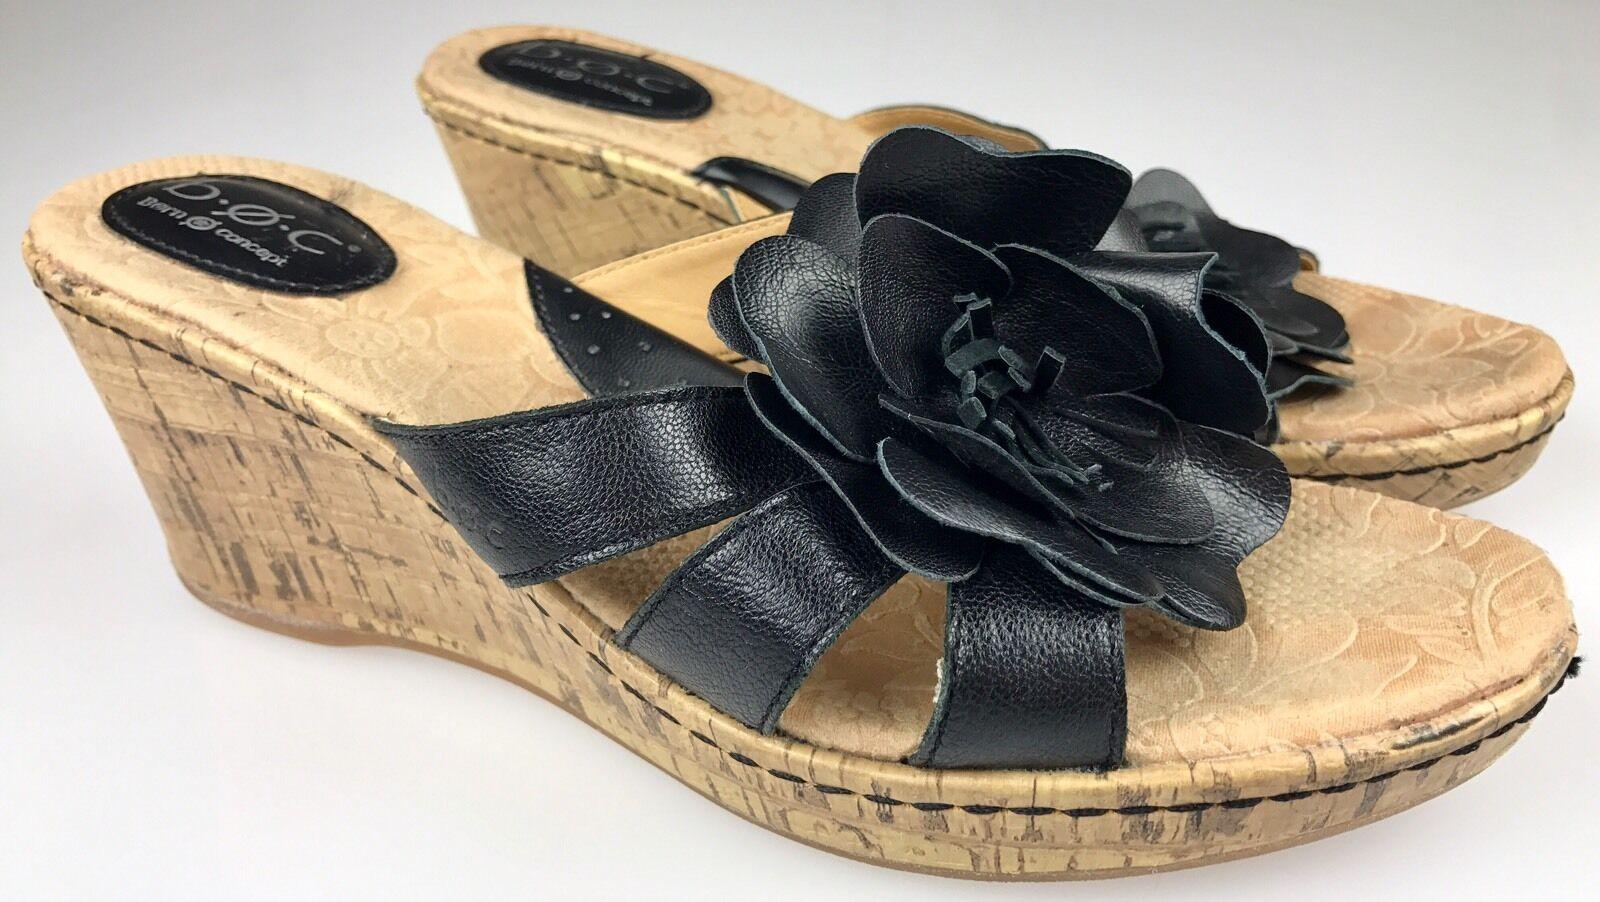 BOC Clementine BORN CONCEPT Women's Cork Wedge Sandals Heels Clementine BOC Black Flower 9 40.5 1af96c